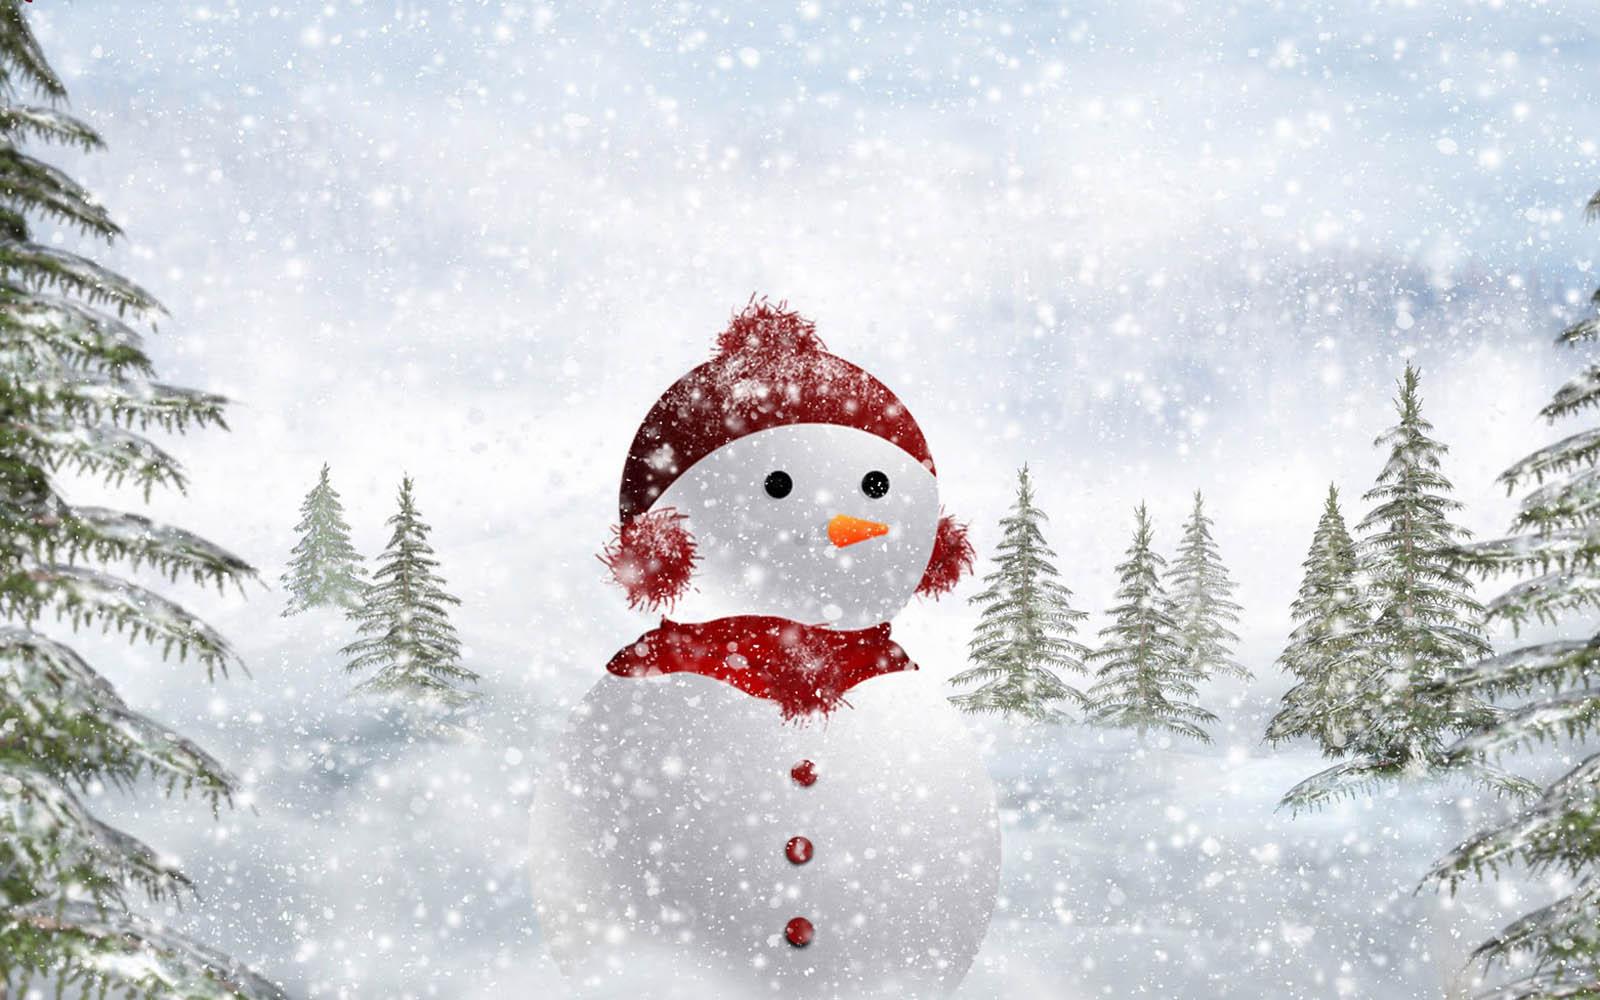 snowman desktop background - photo #2